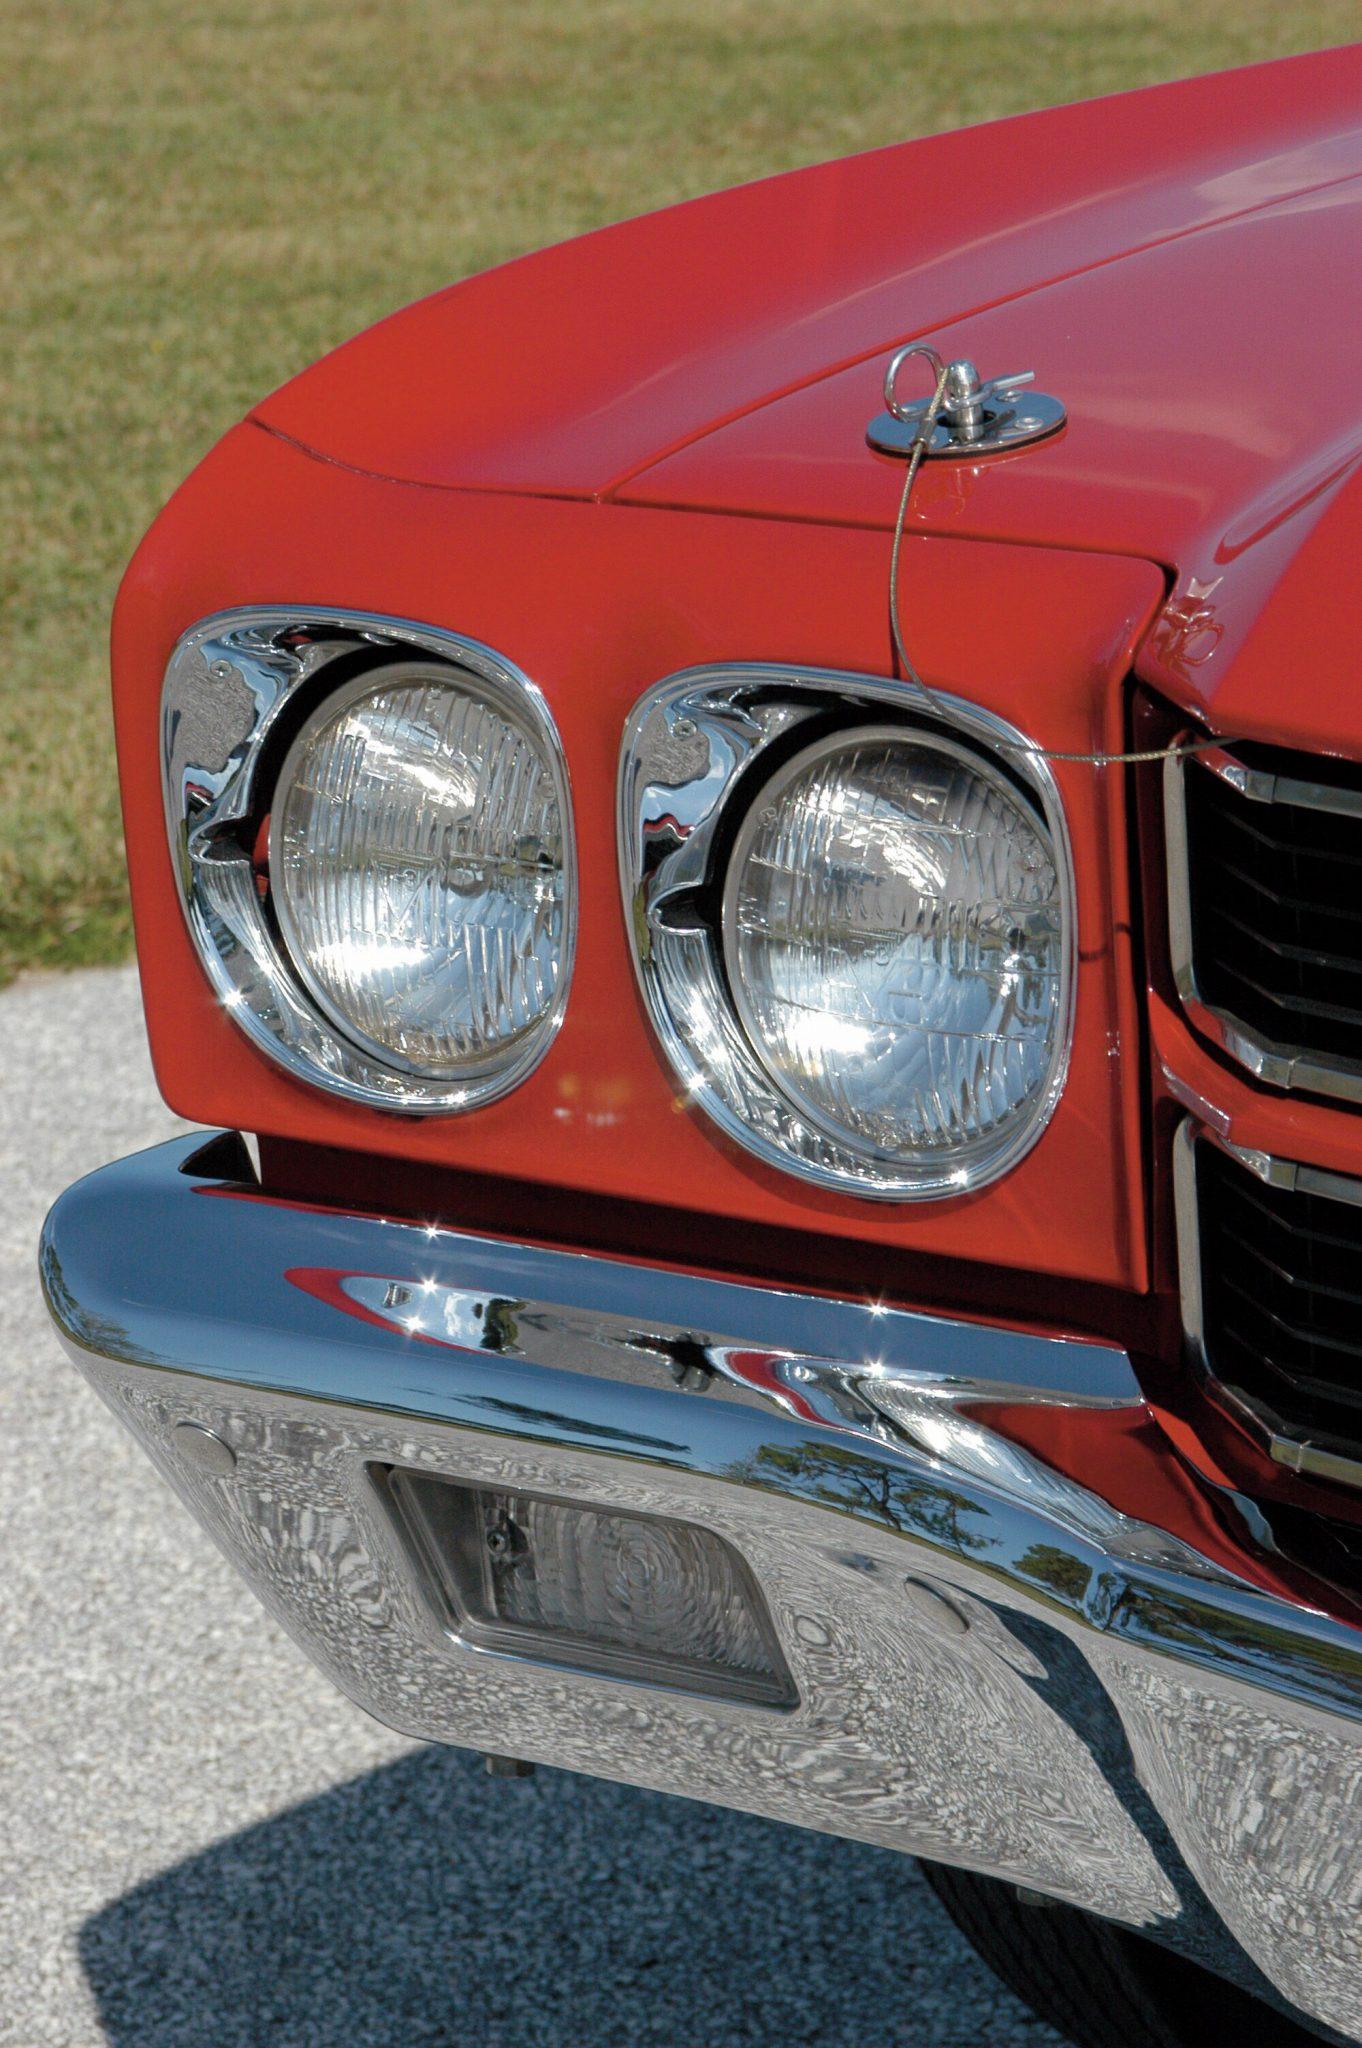 hight resolution of 1970 chevelle ls6 headlamp detail